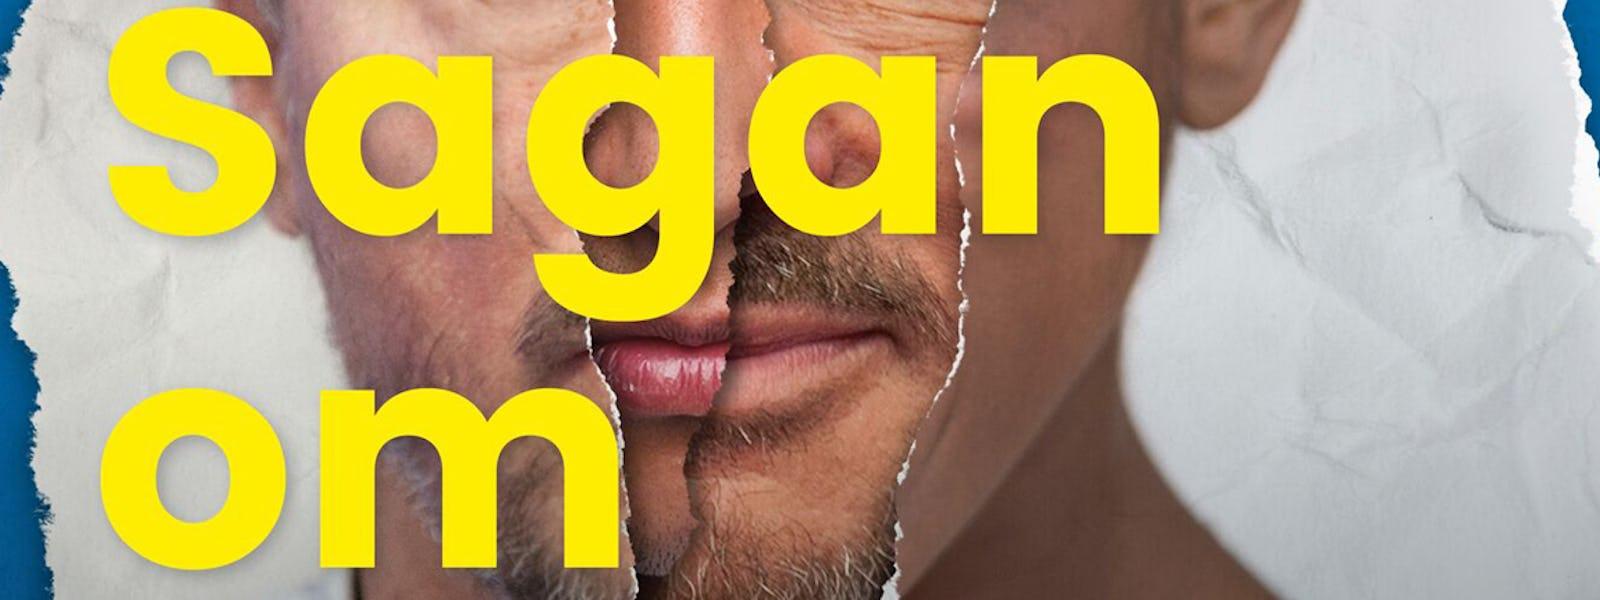 Bild - Sagan om Sverige